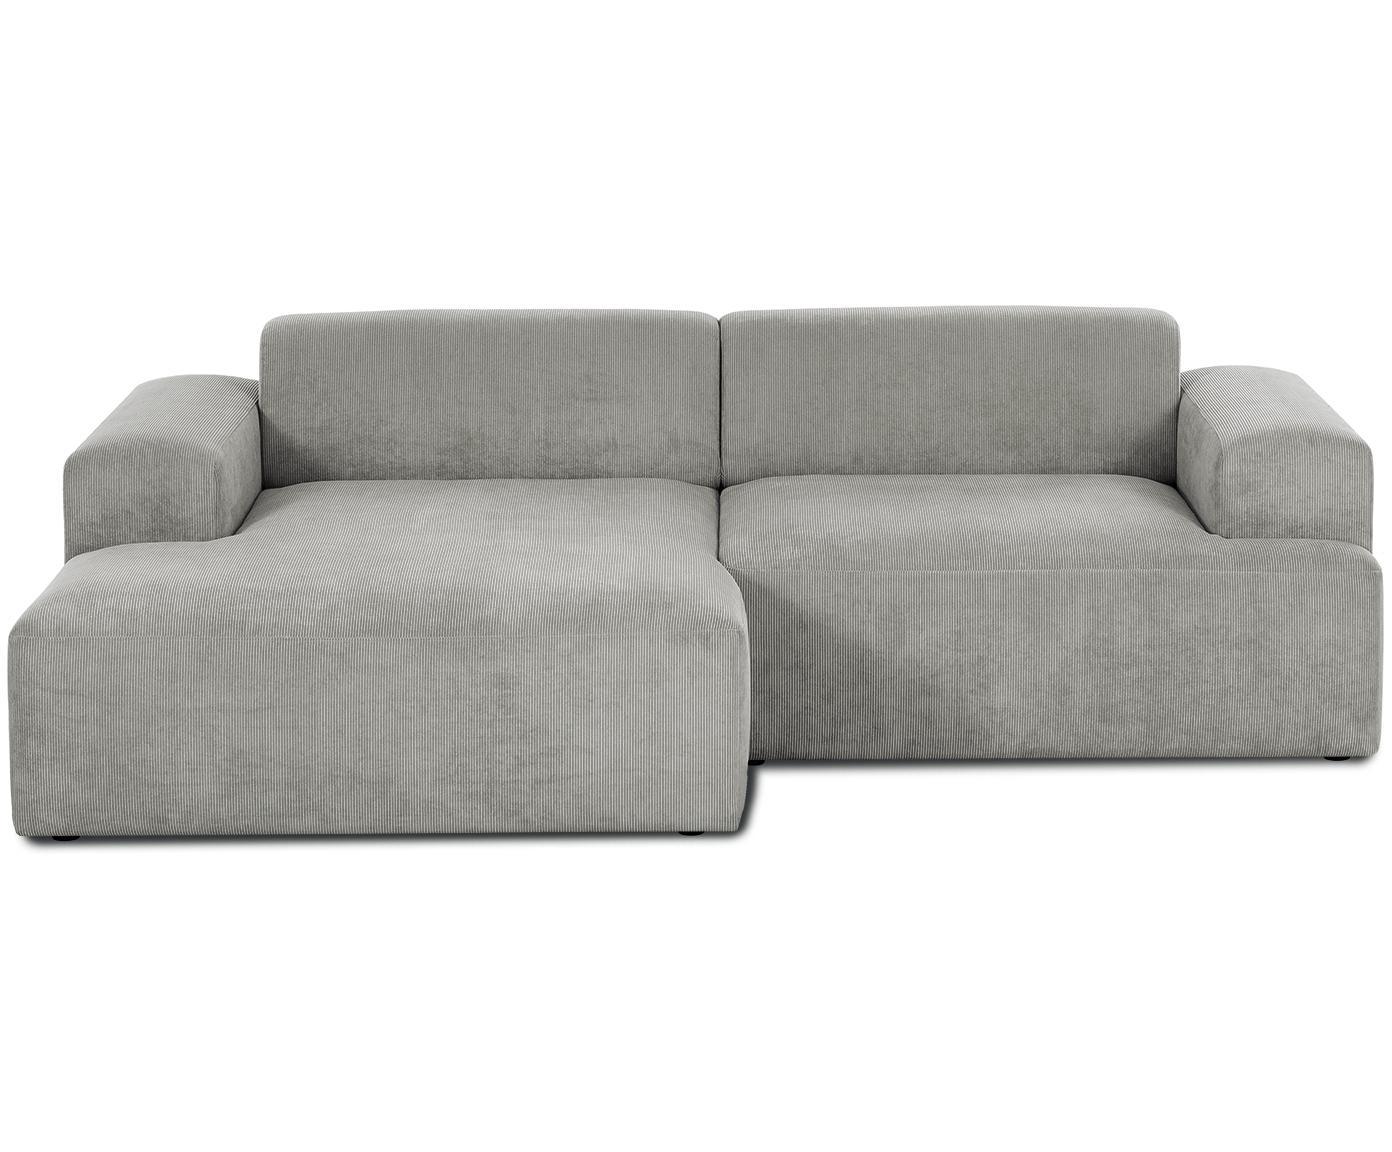 Cord-Ecksofa Melva (3-Sitzer), Bezug: Cord (92% Polyester, 8% P, Gestell: Massives Kiefernholz, Spa, Cord Grau, B 240 x T 144 cm